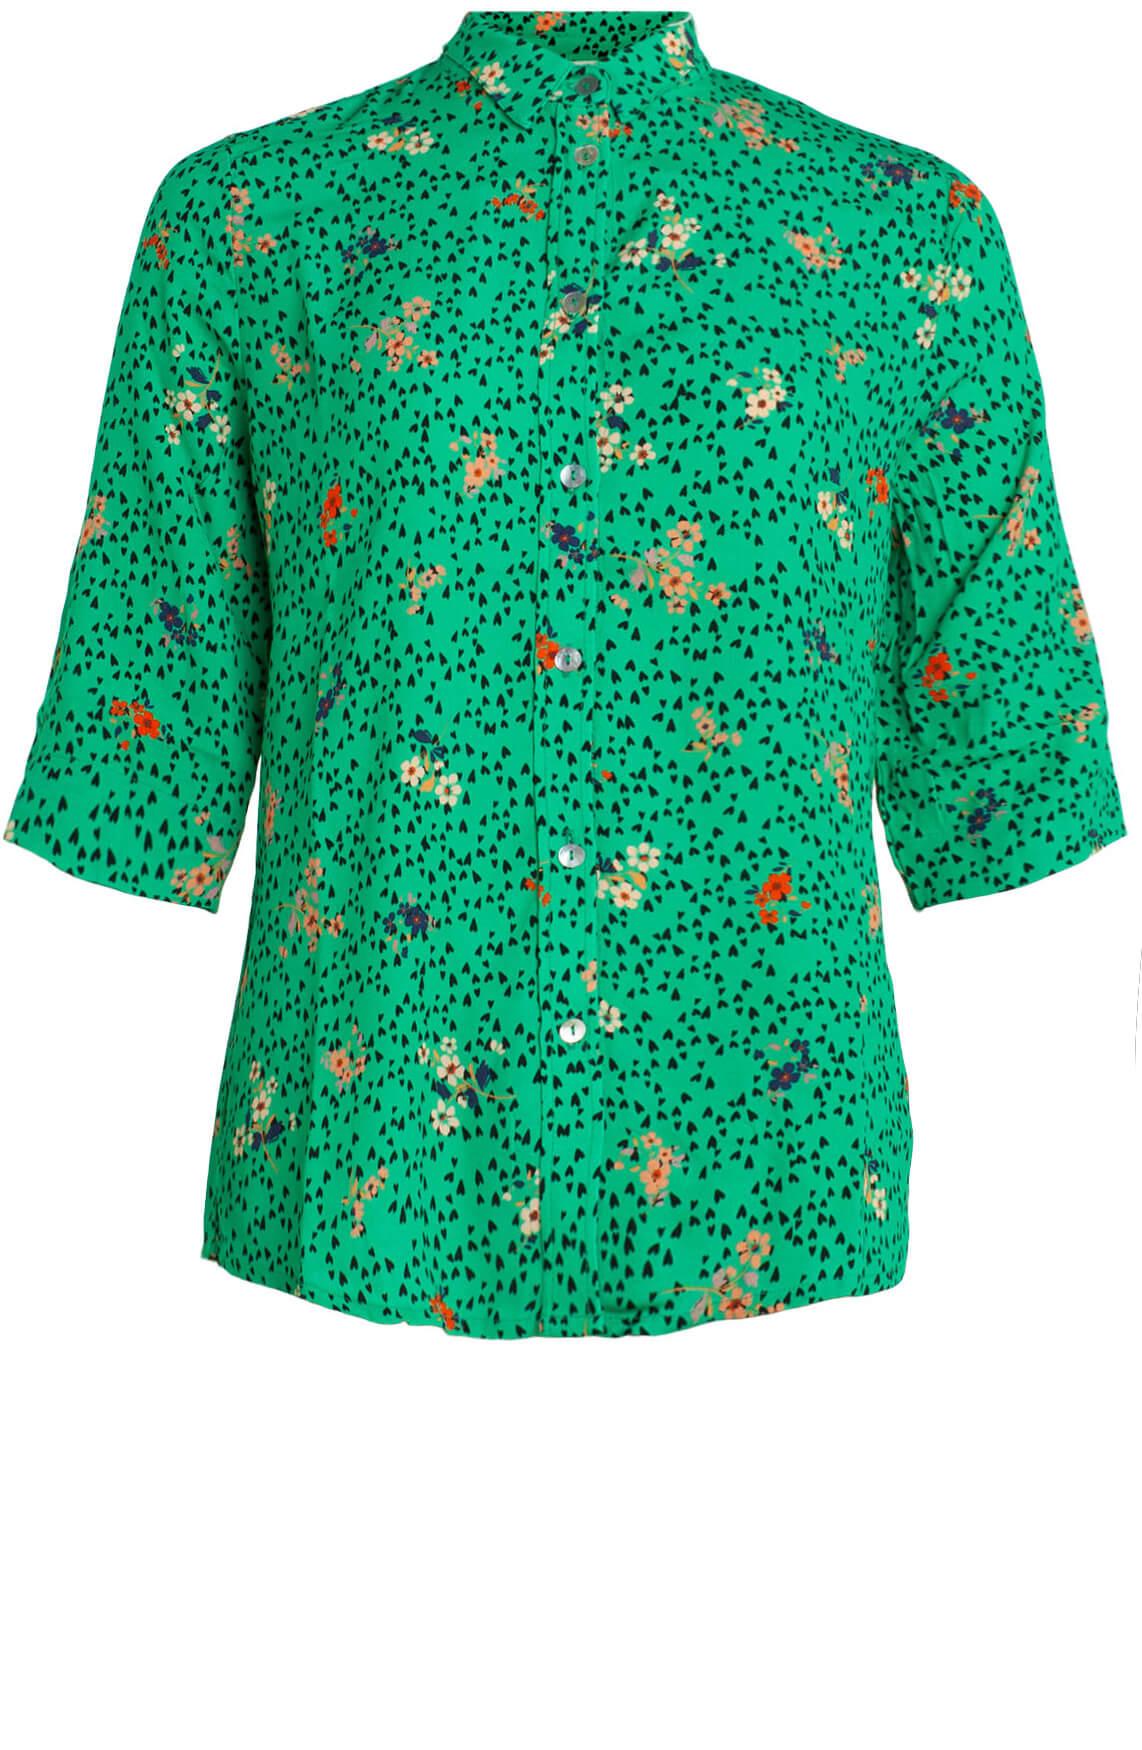 Anna Dames Blouse met print groen